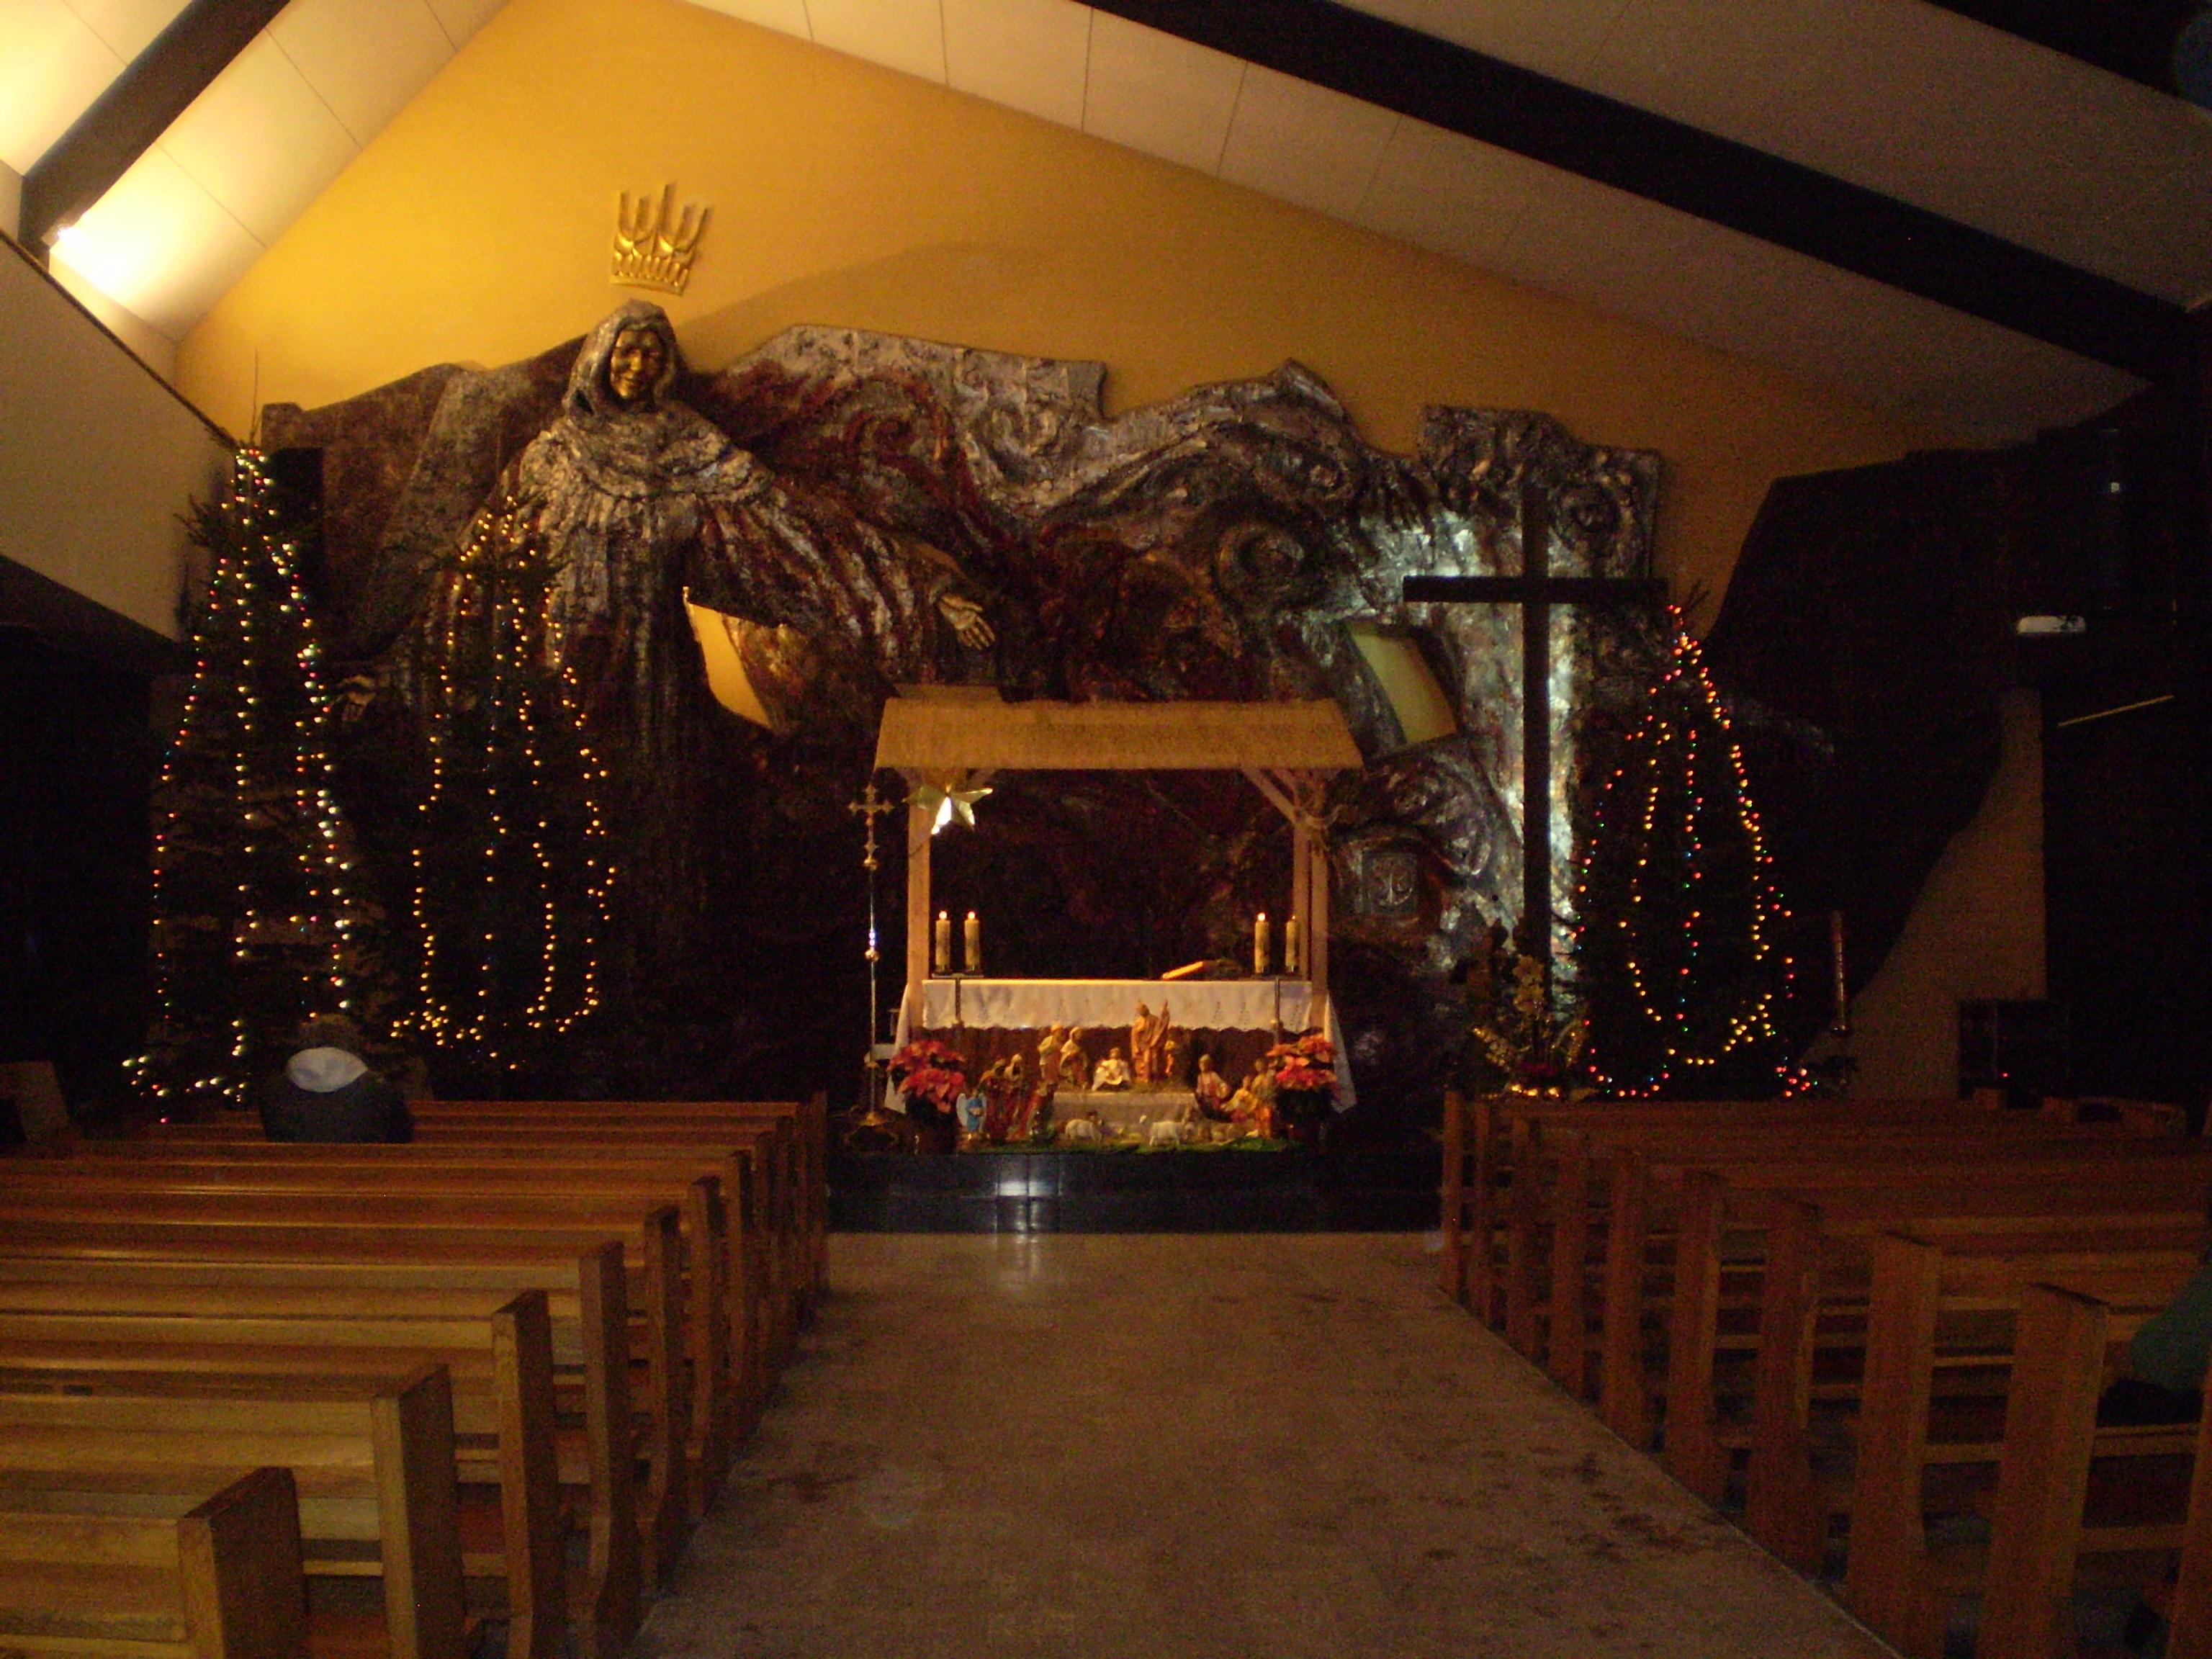 ... Queen of the World; Nativity scenes 2010 - 001.jpg - Wikimedia Commons